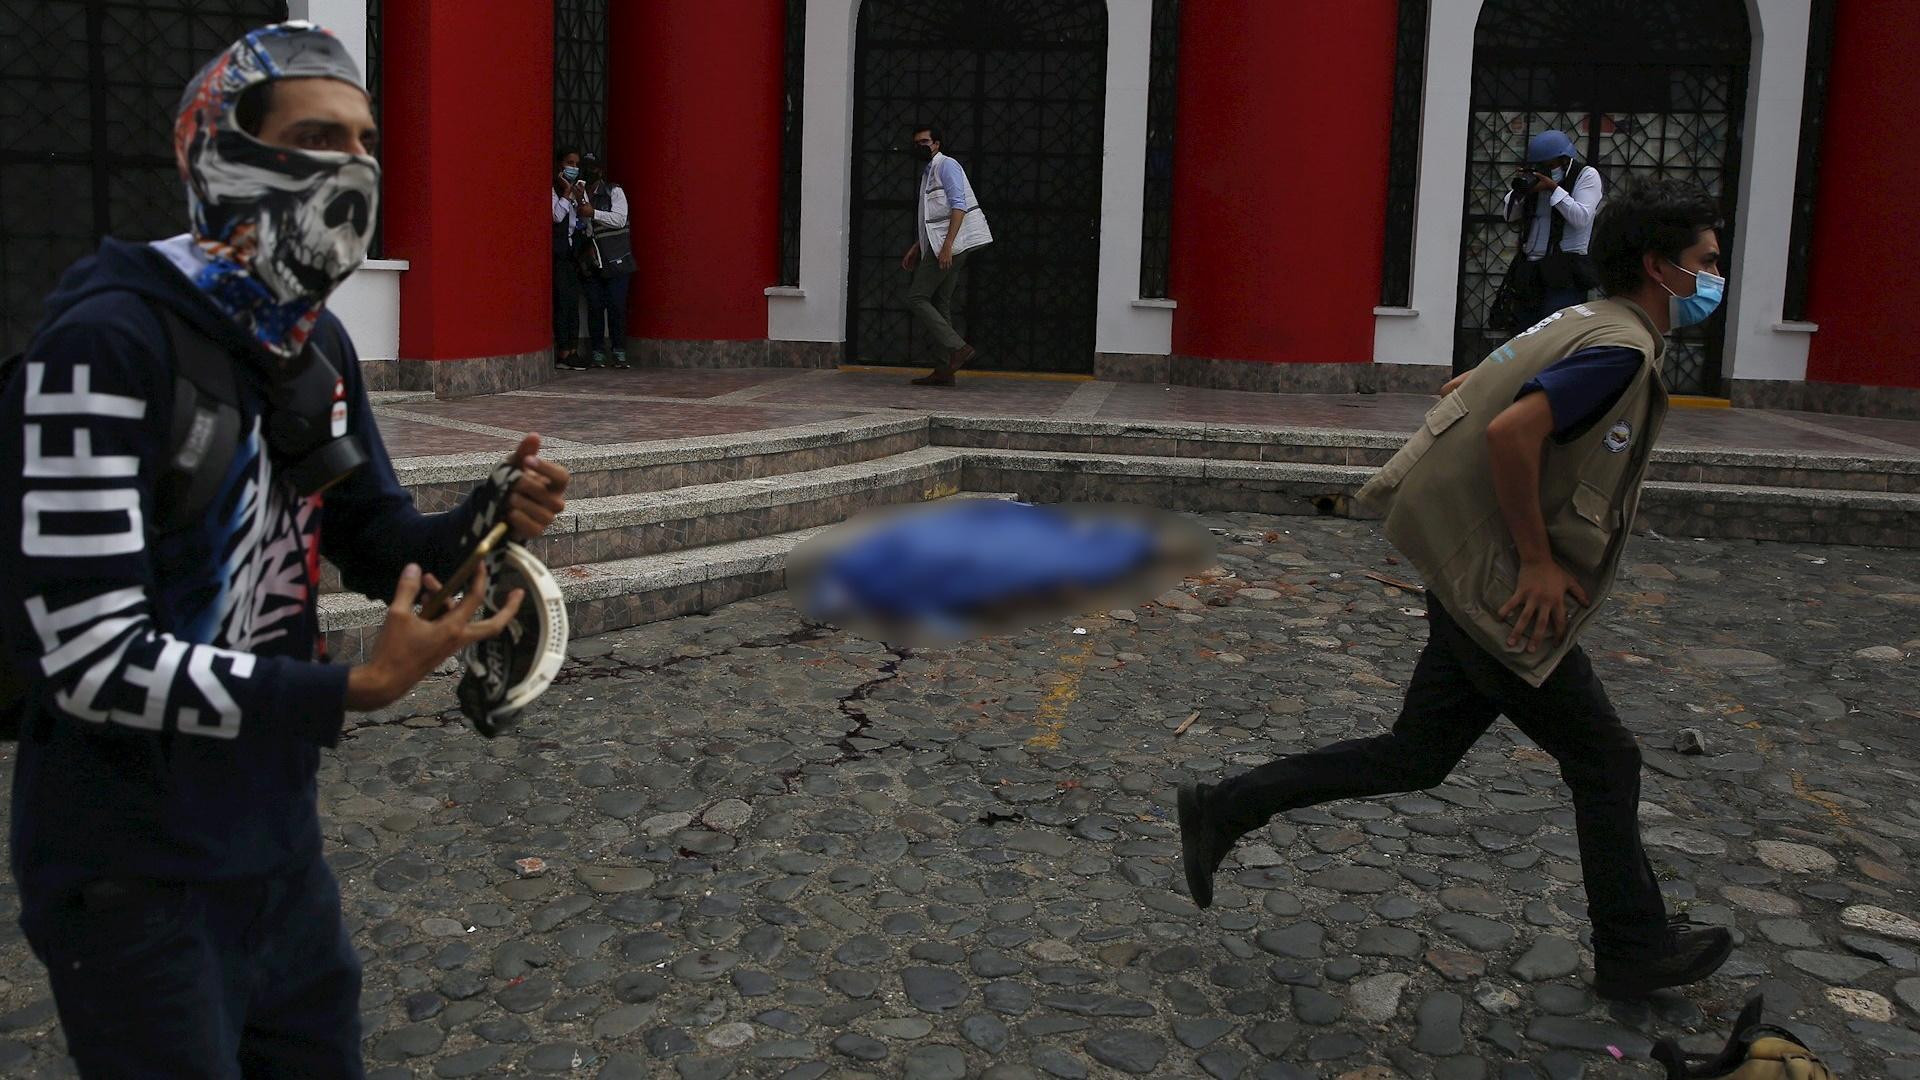 Cali colombia muerto protesta disparos ataque